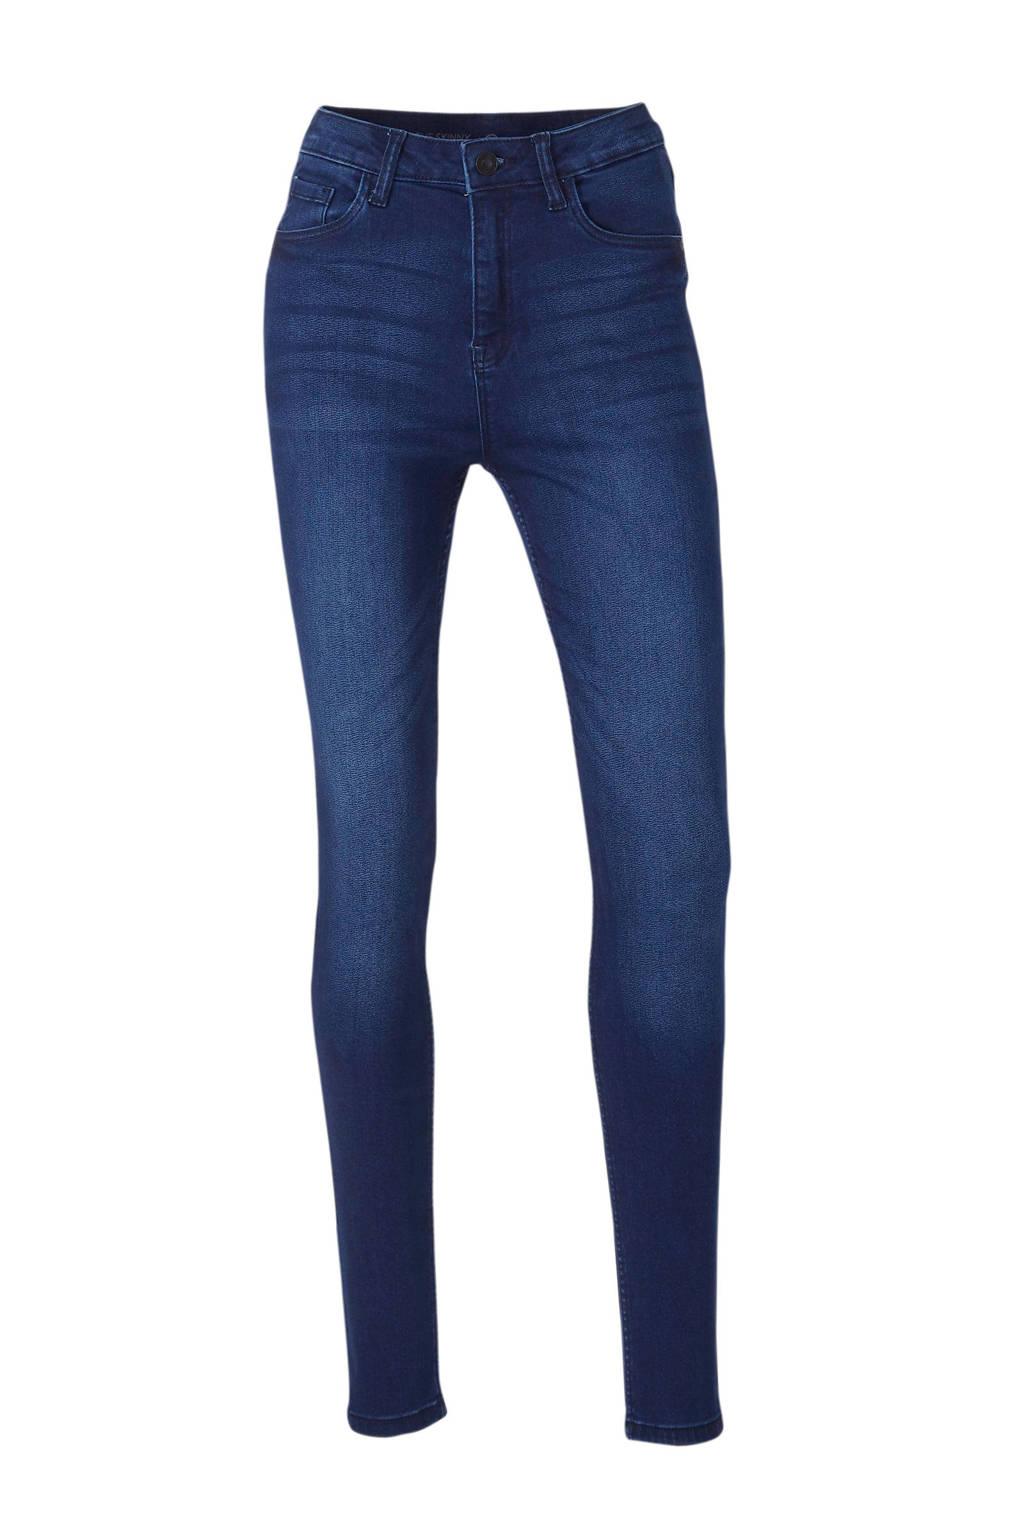 C&A The Denim high waist skinny jeans donkerblauw, Donkerblauw